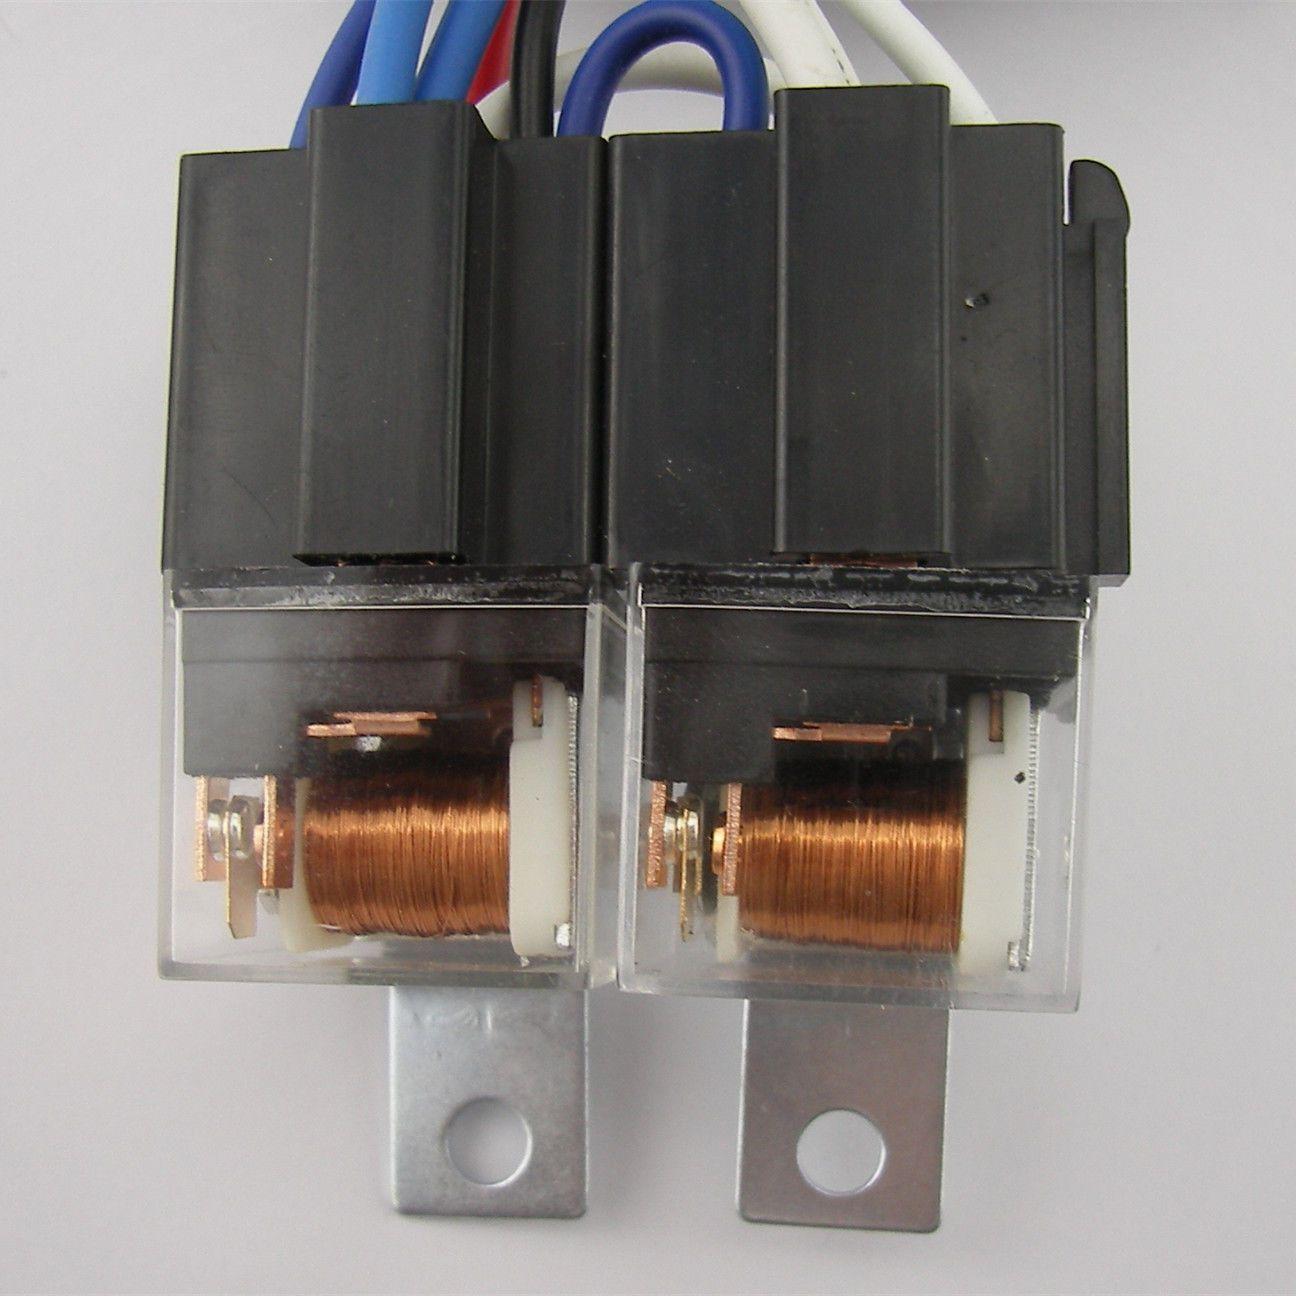 oem h4 headlight relay wiring harness system 4 headl light bulb